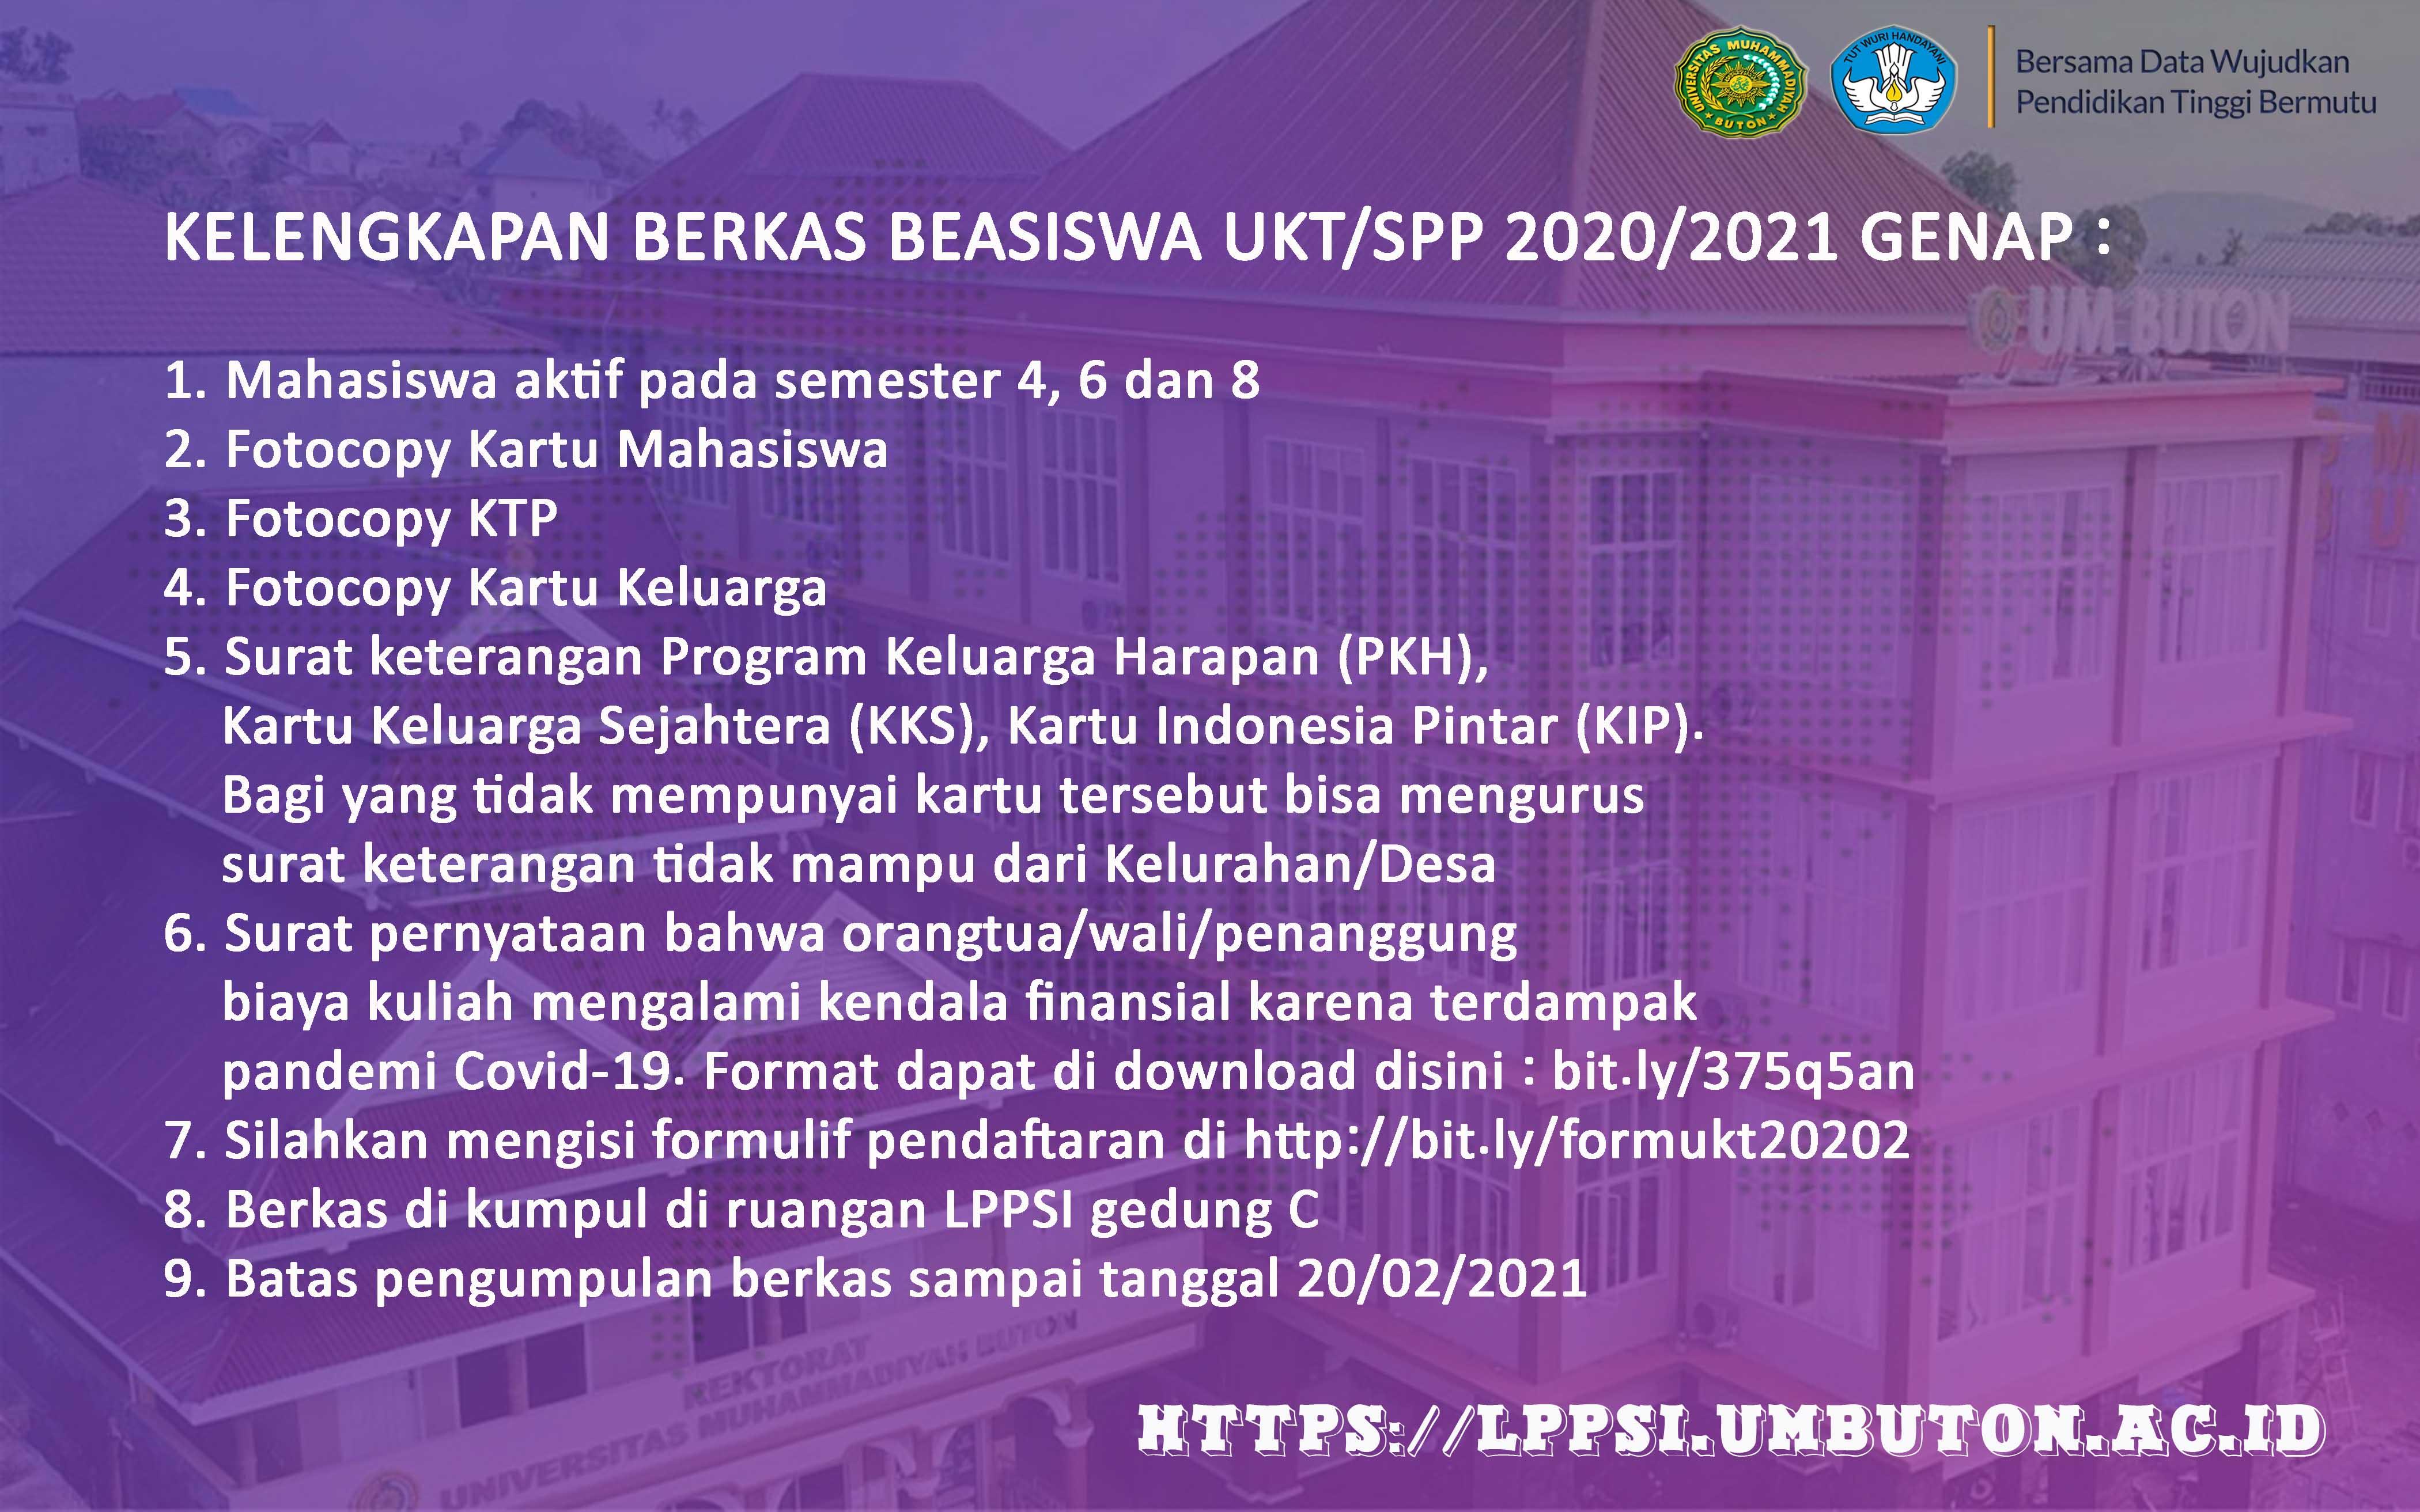 PENDAFTARAN BANTUAN UKT/SPP SEMESTER GENAP 2020/2021